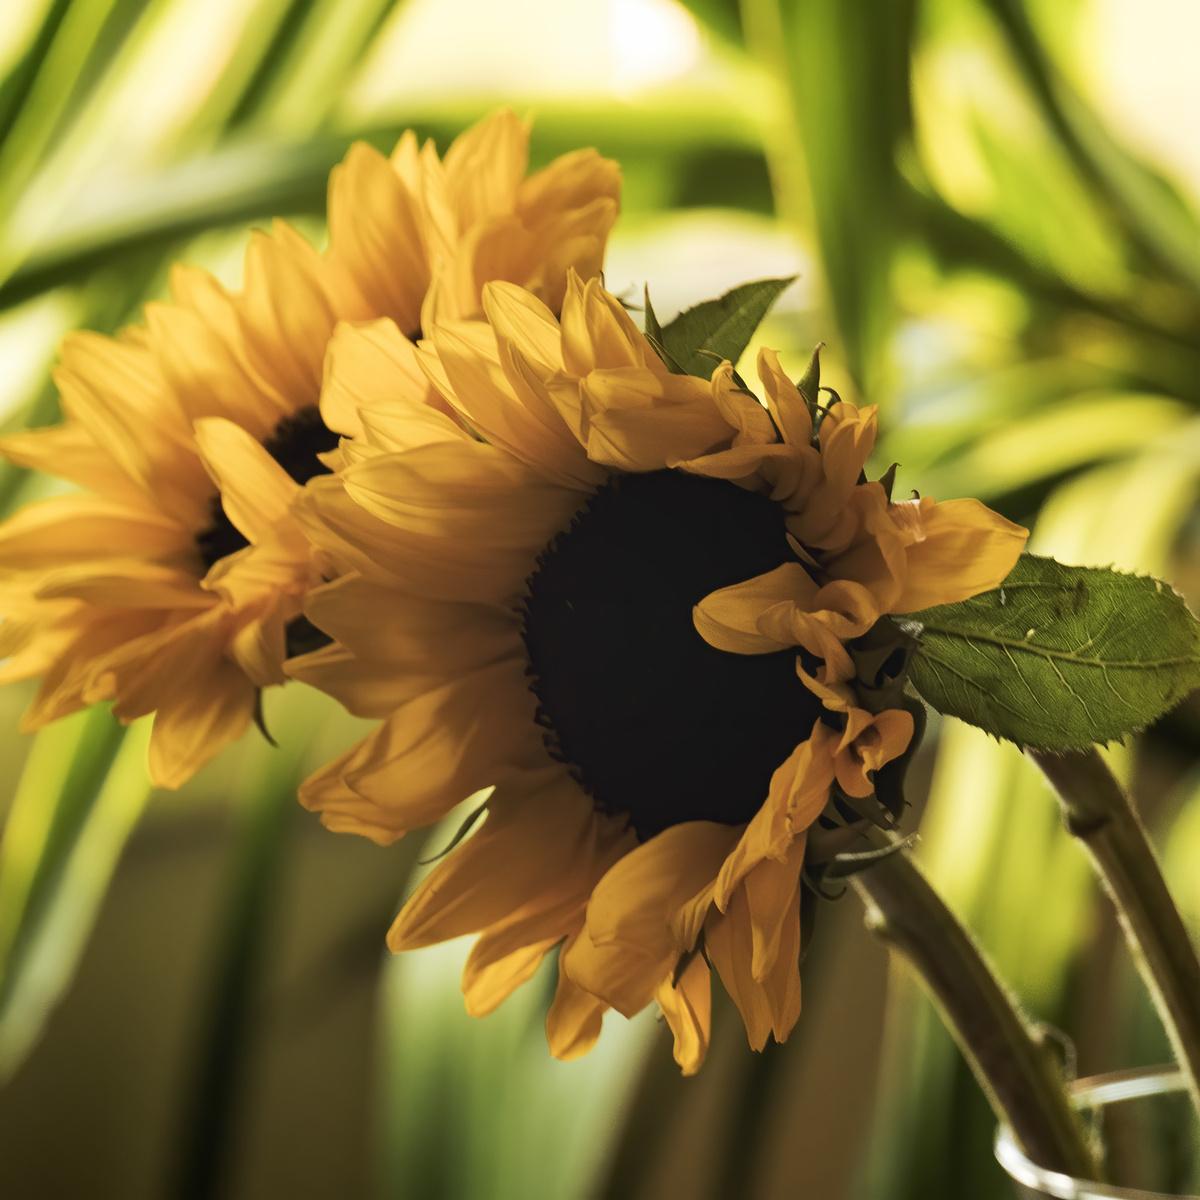 sunflowers in december